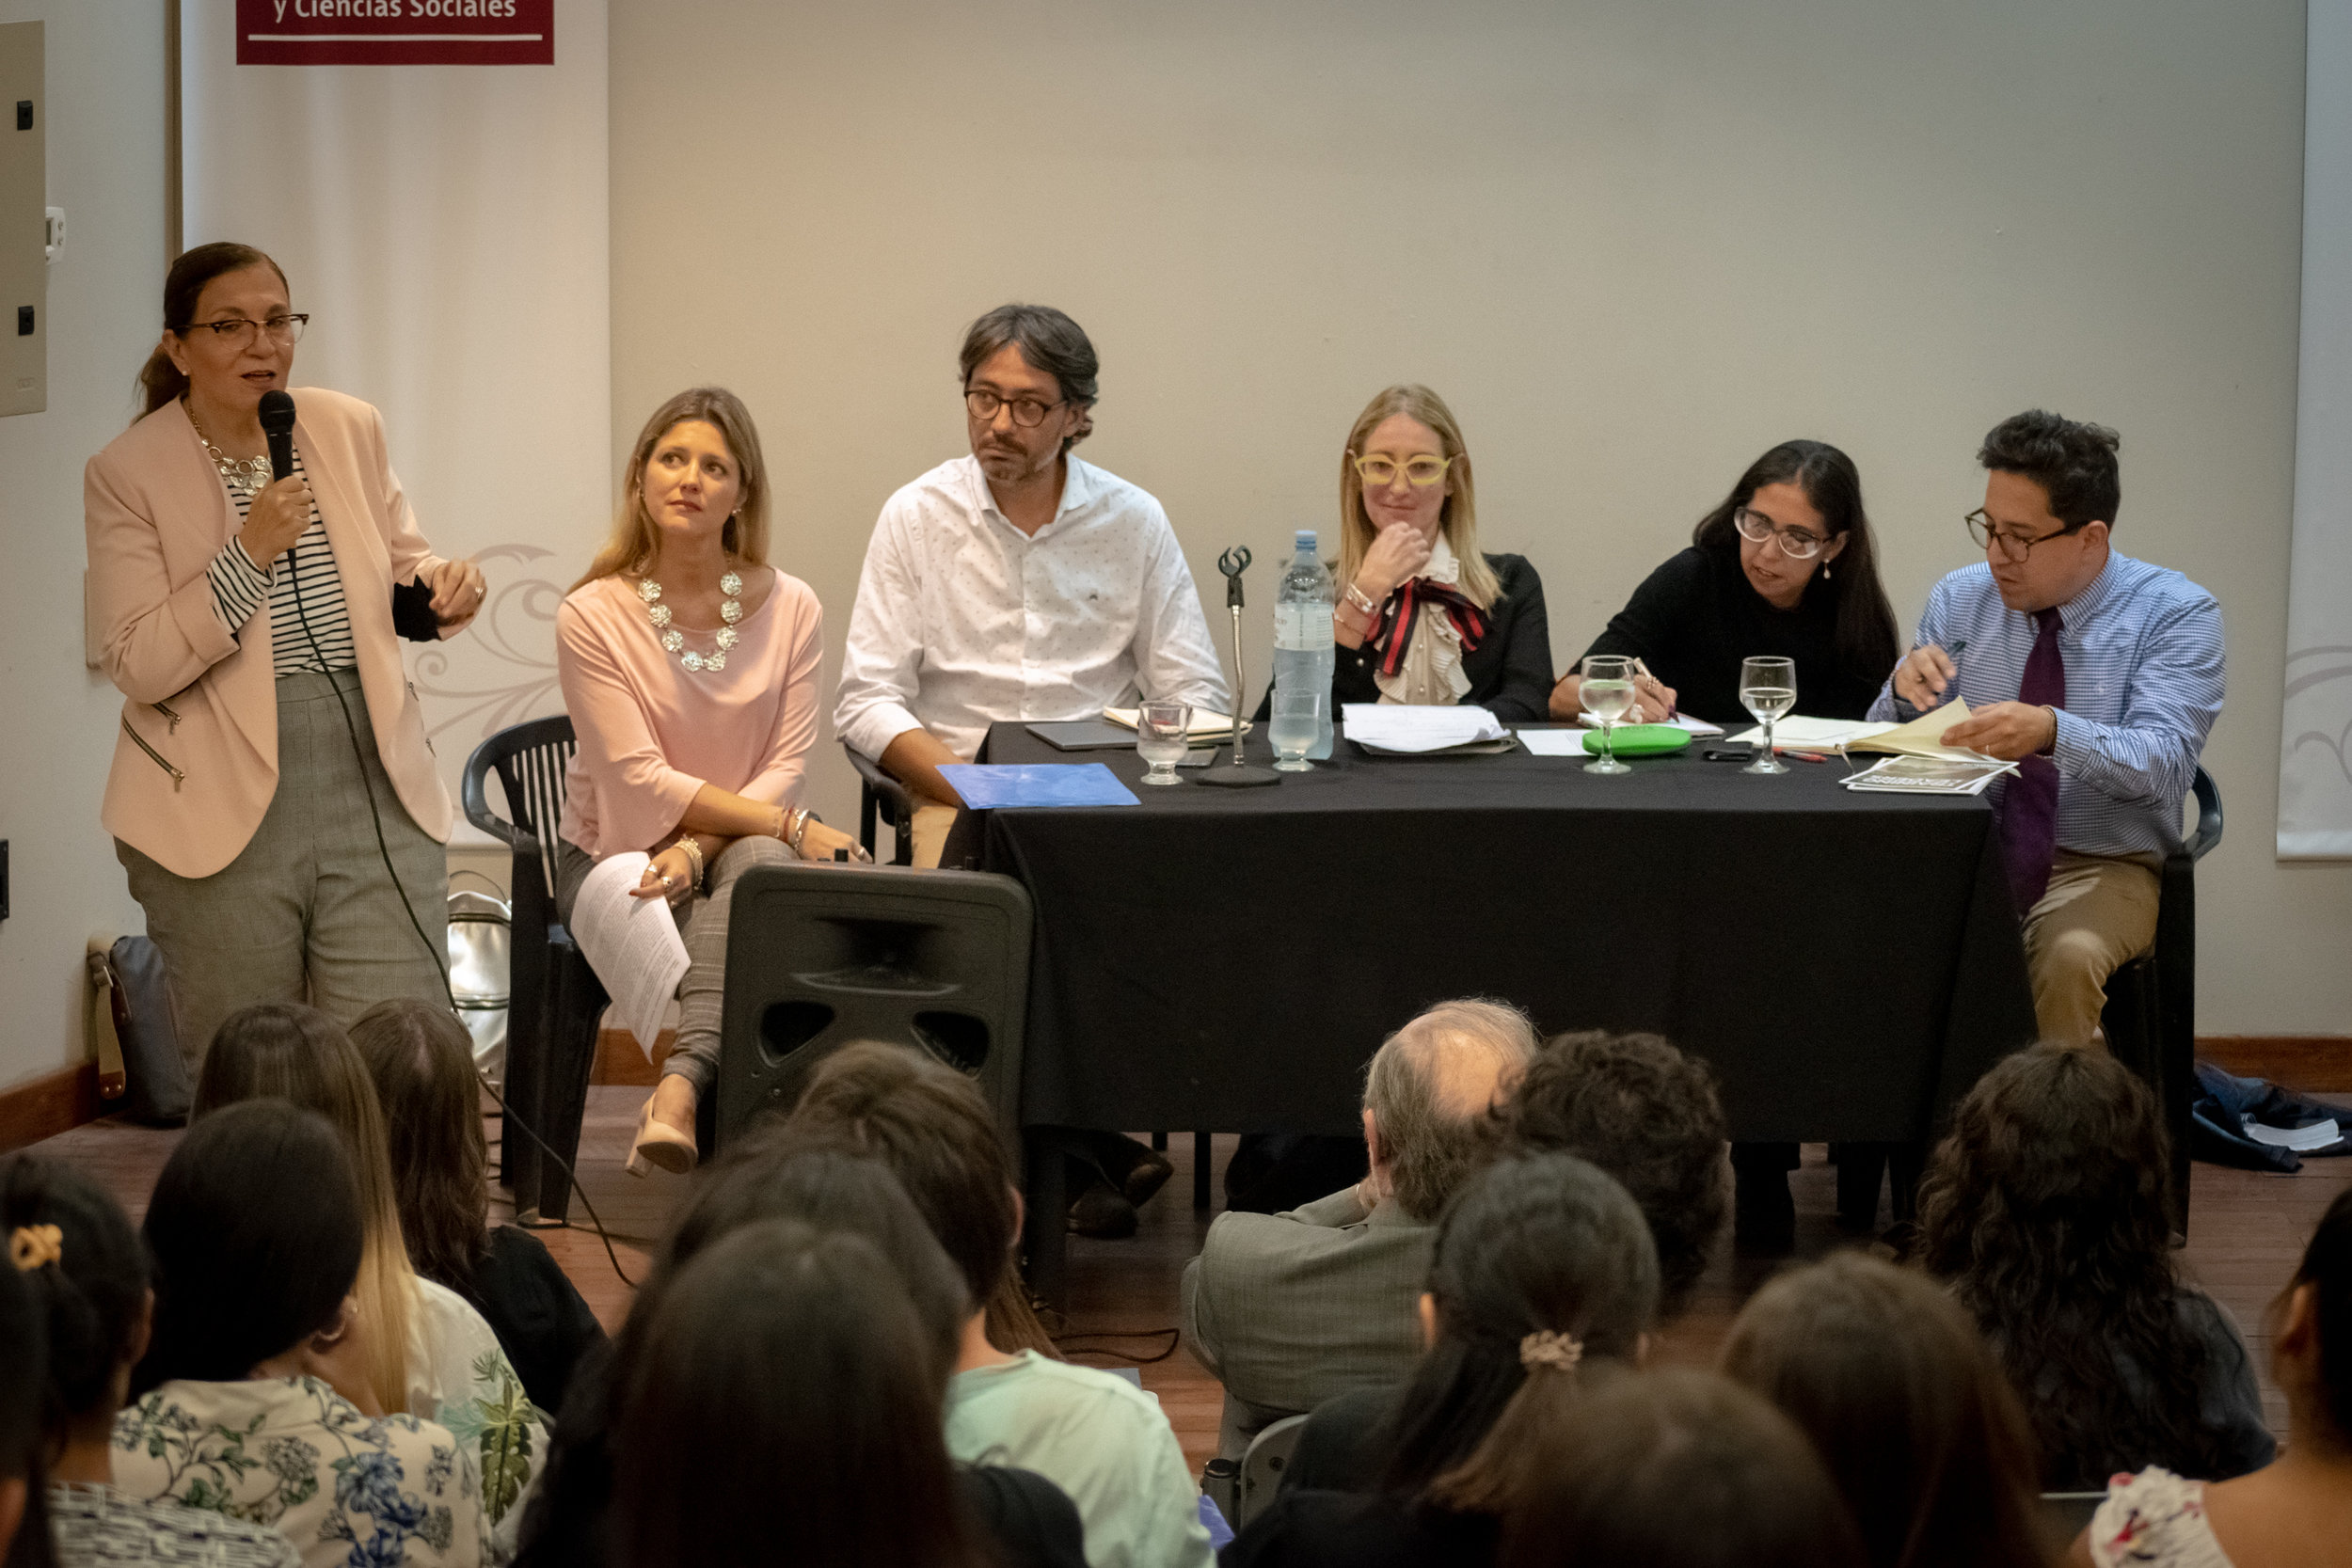 Amnistía Internacional Argentina / Demián Marchi